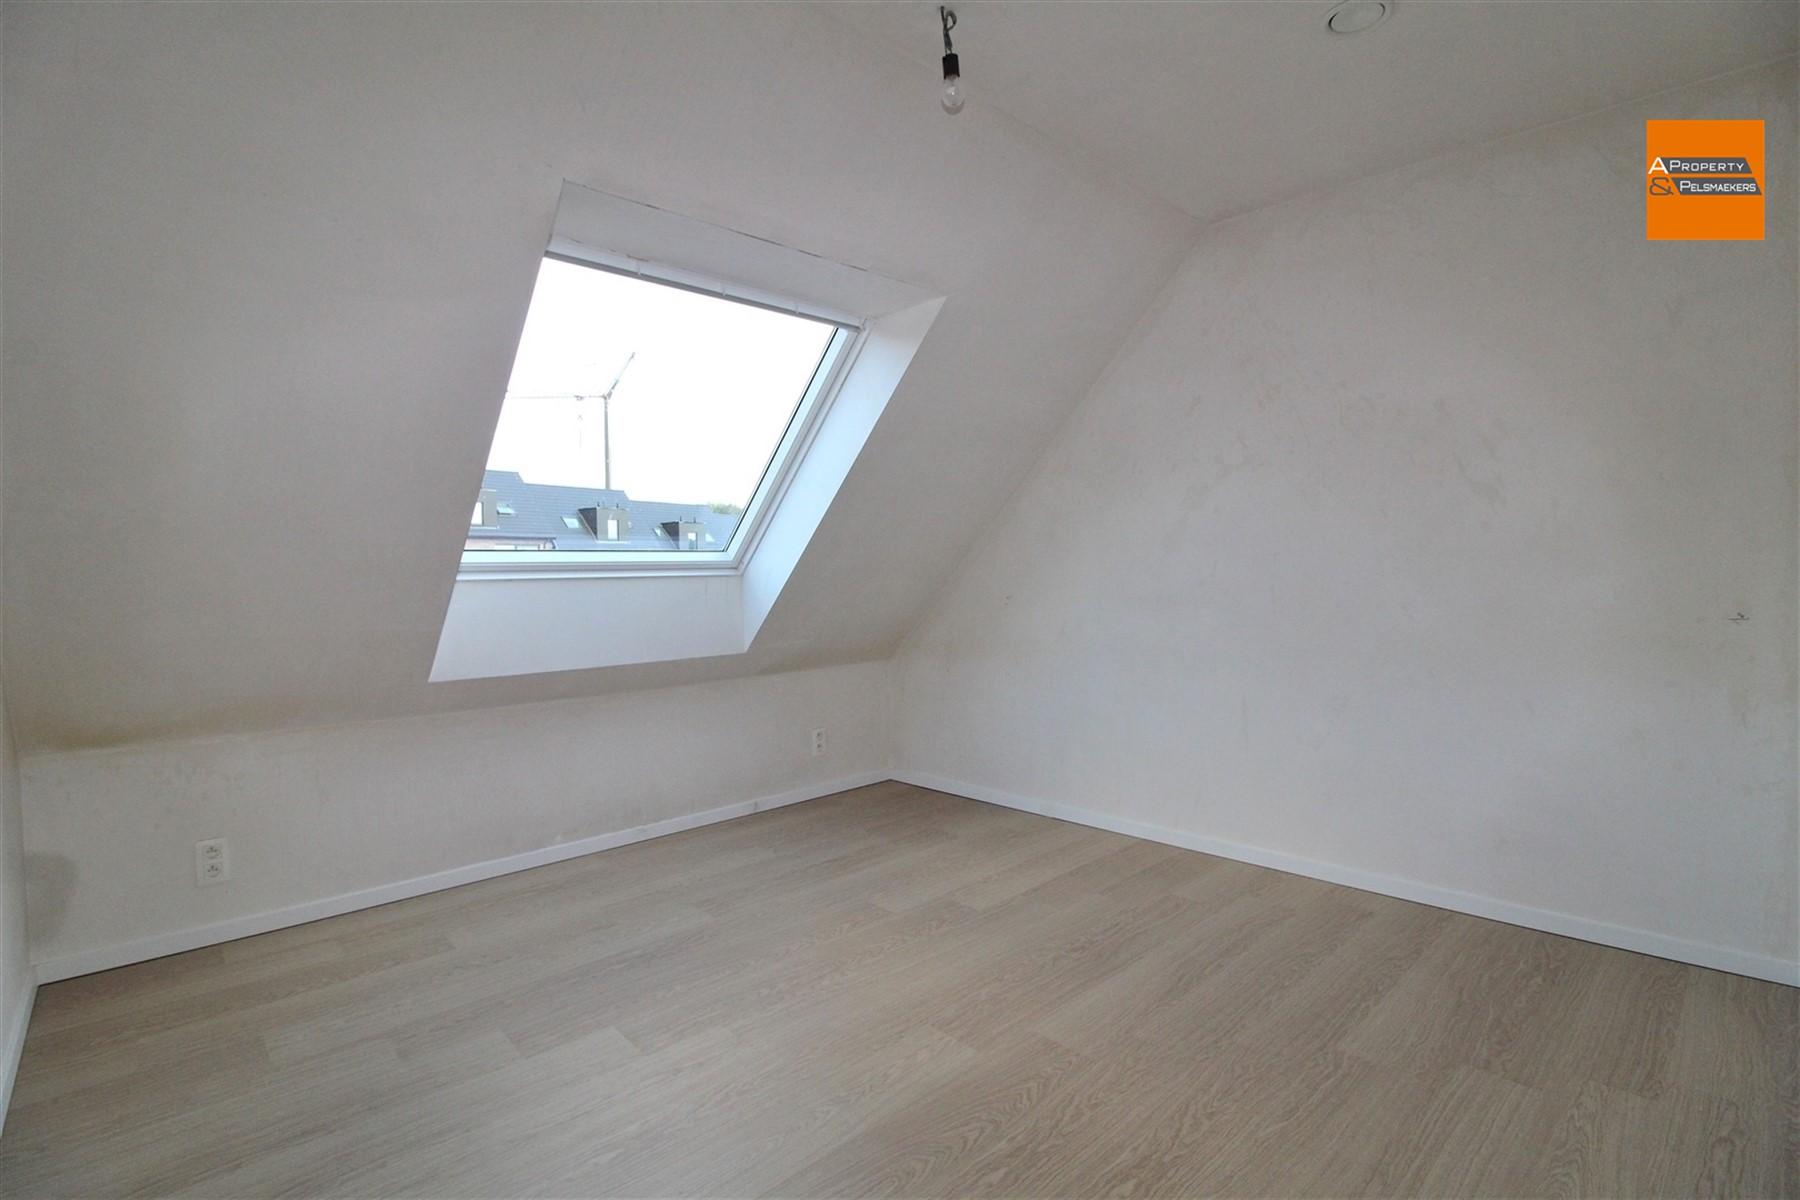 Foto 10 : Duplex/triplex in 3060 BERTEM (België) - Prijs € 319.000